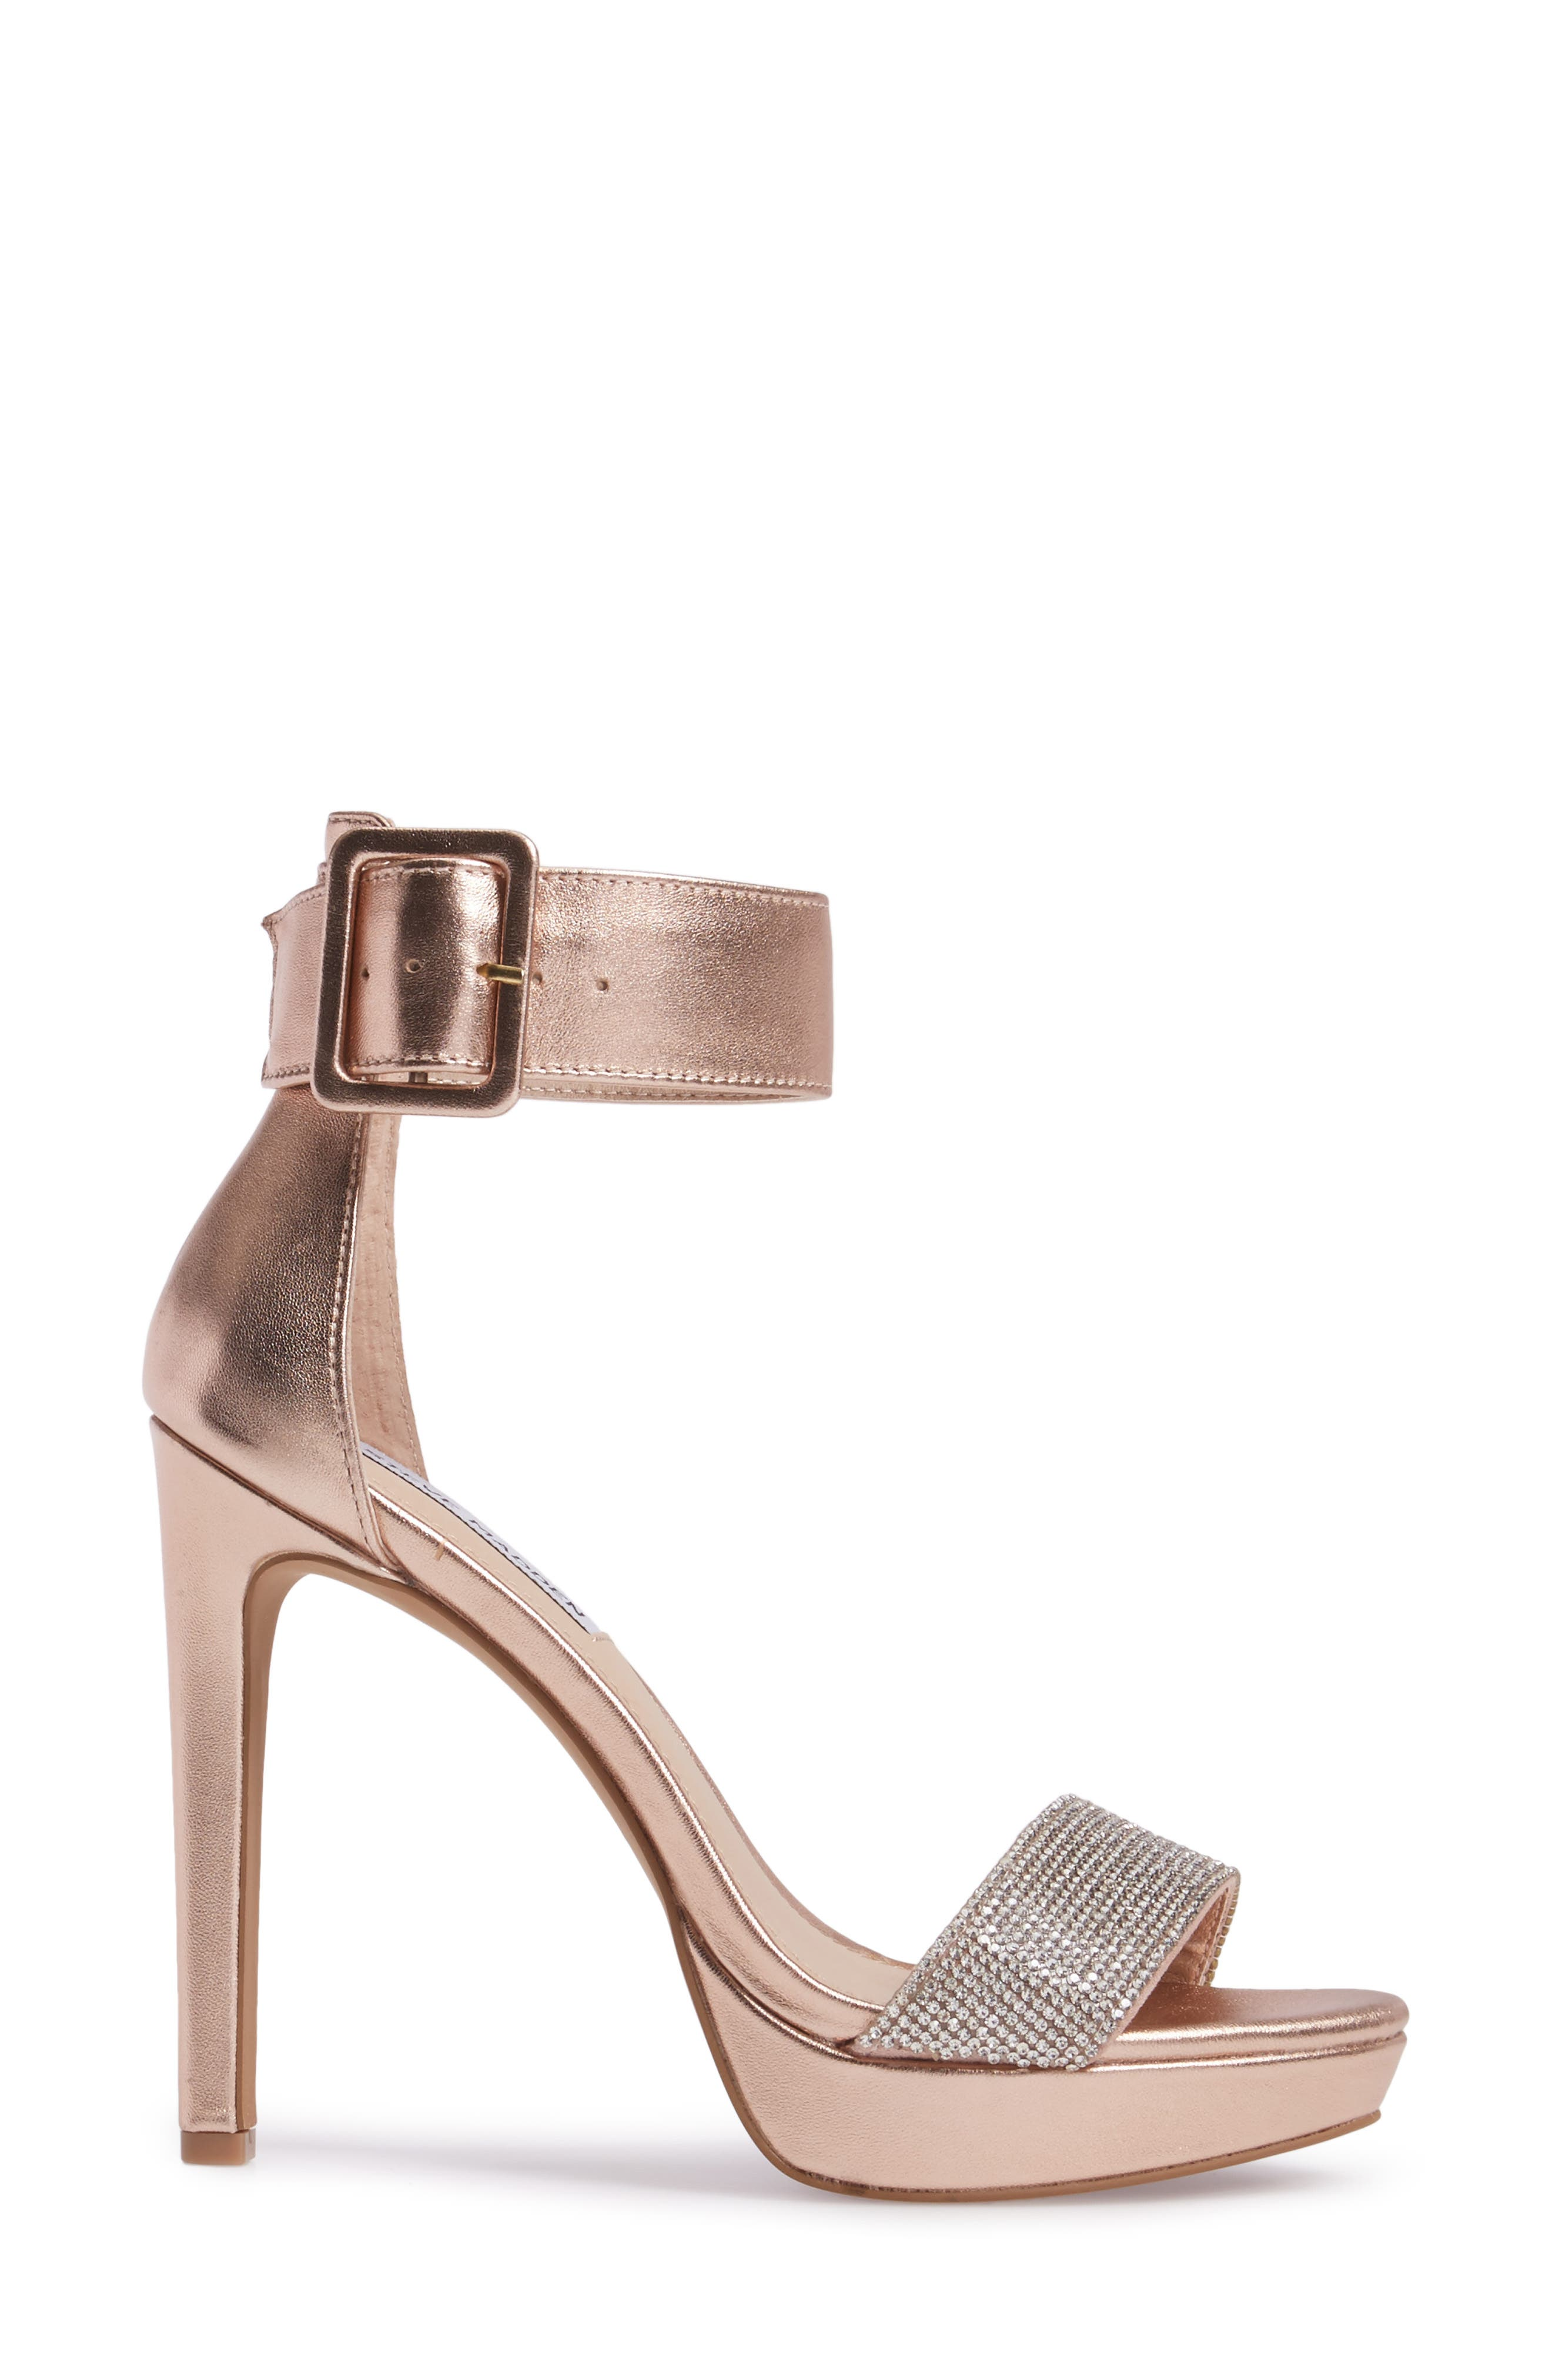 Circuit Sandal,                             Alternate thumbnail 3, color,                             Rose Gold Leather